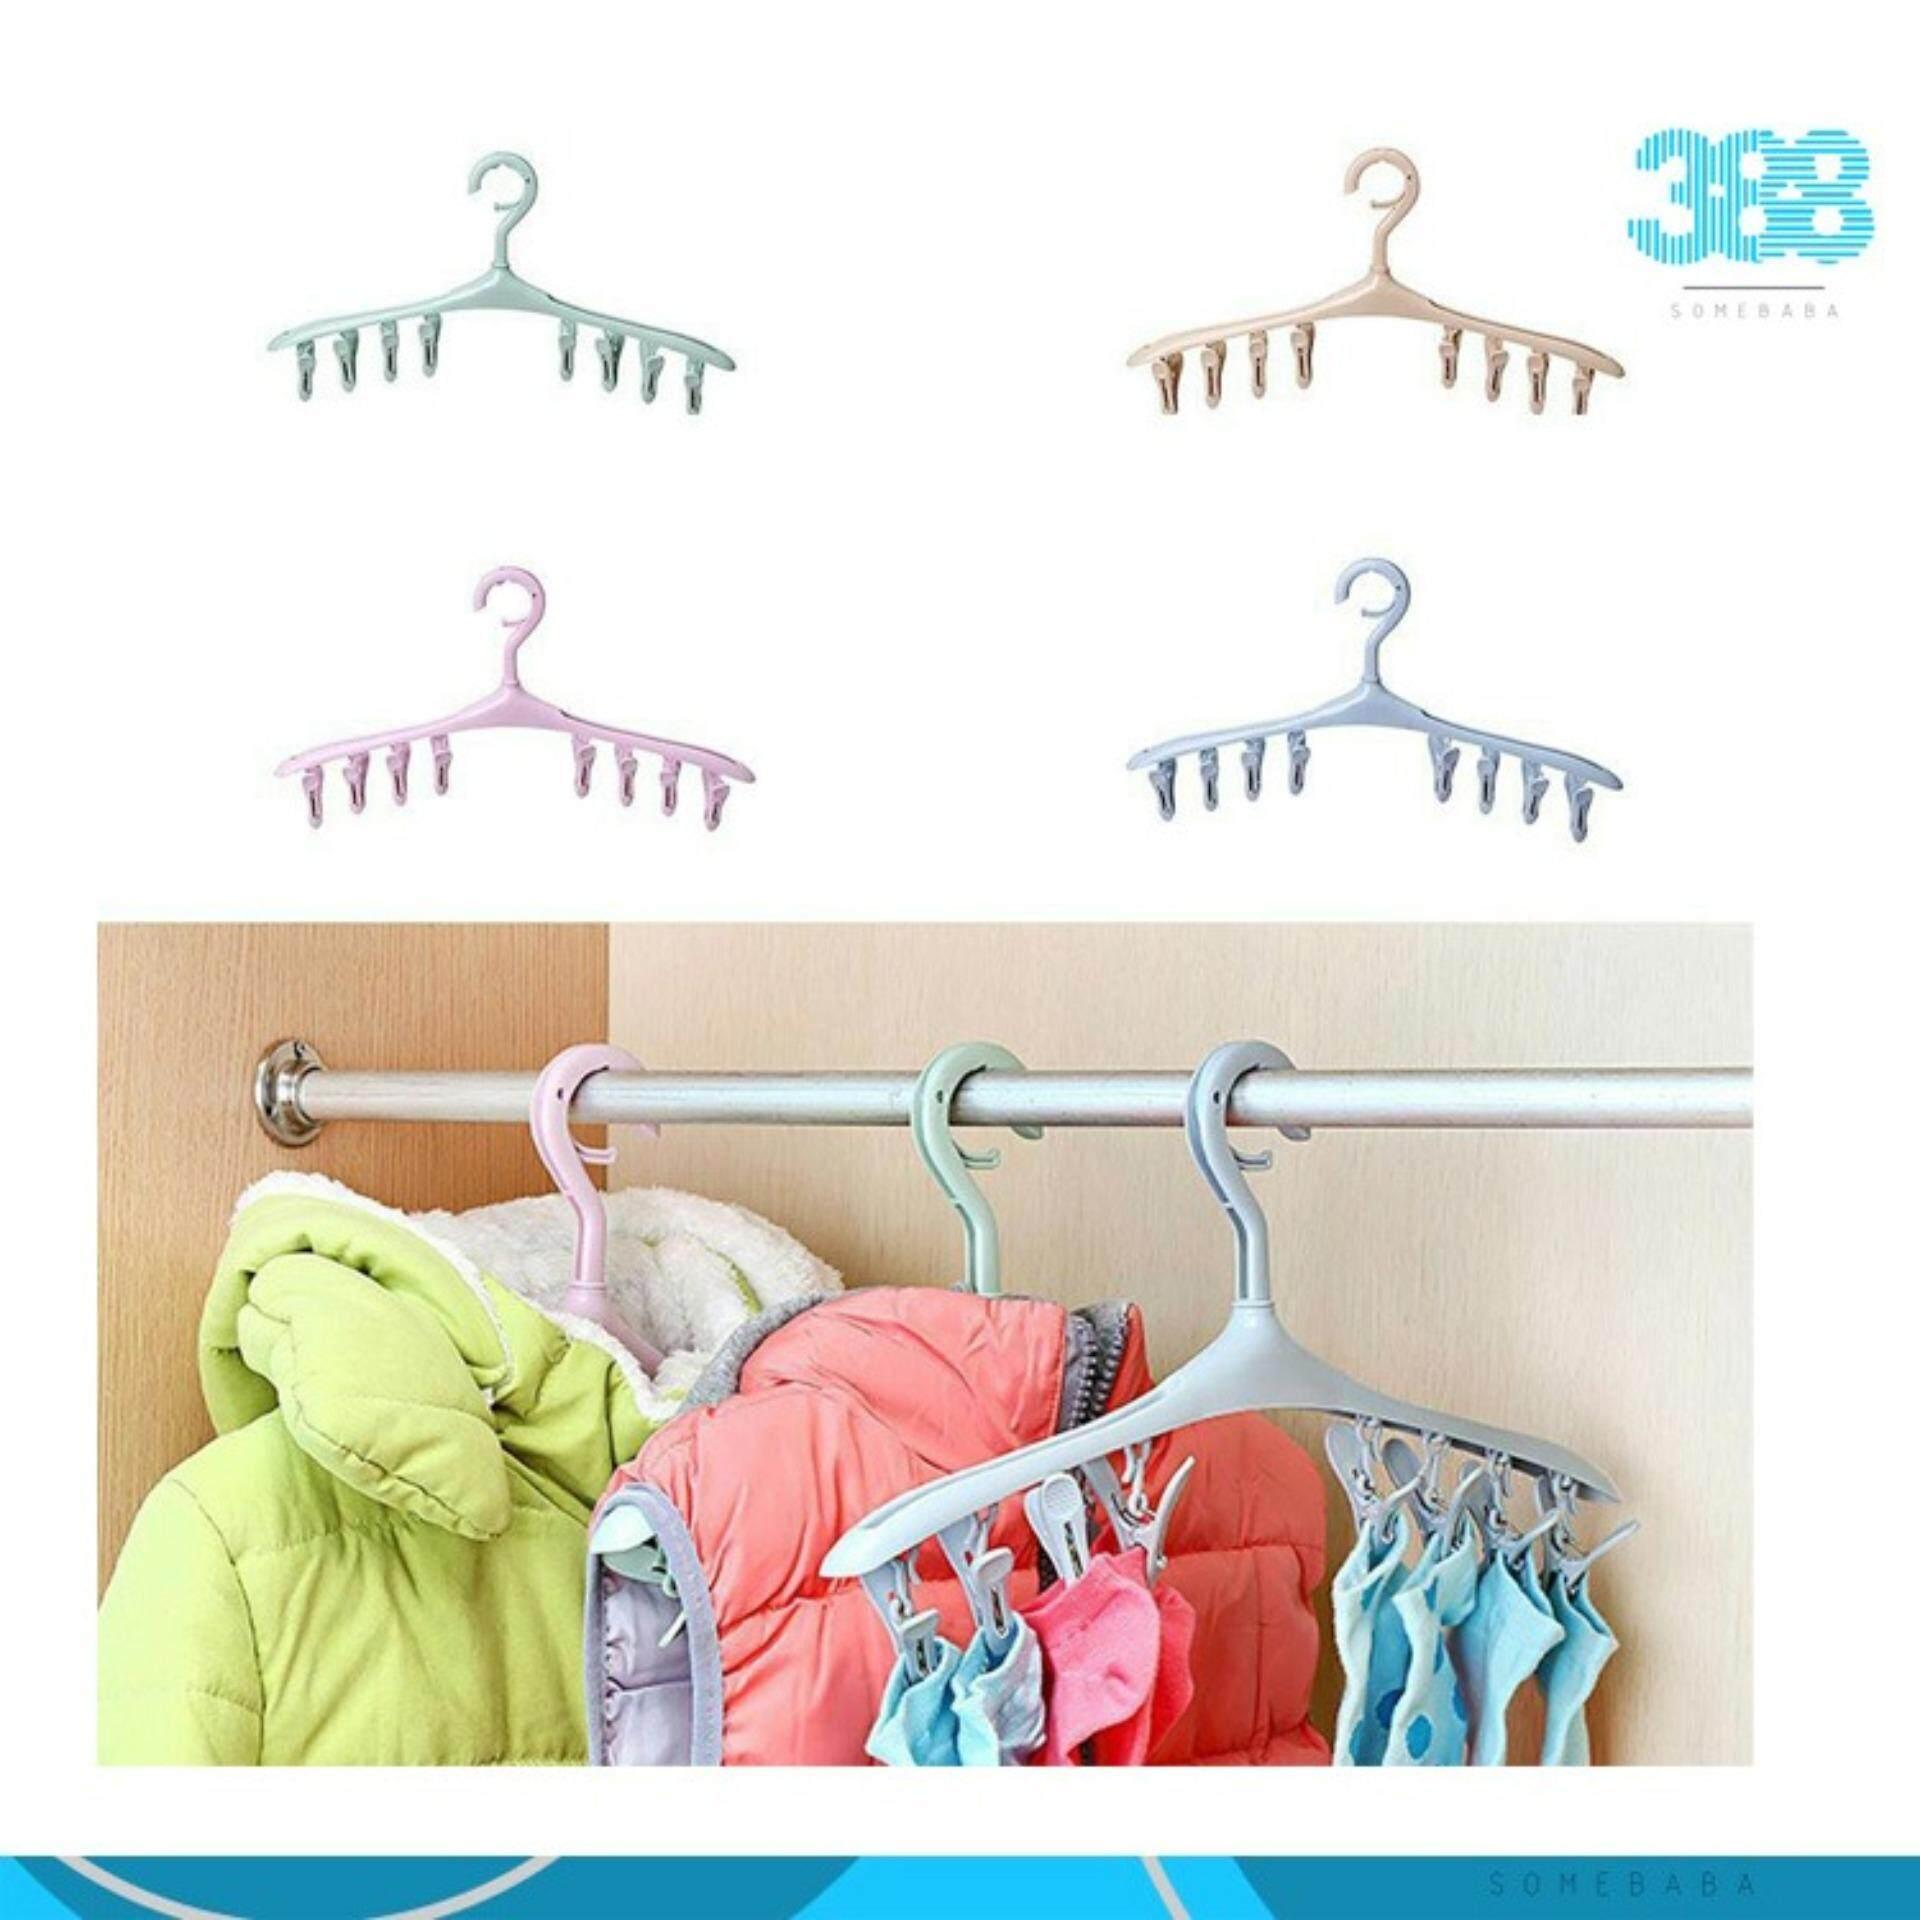 8 Clips Function Plastic Windproof Clothes Hanger Socks Rack Hanger, Underwear Drying Hanger Clothes Rack - Random Colour